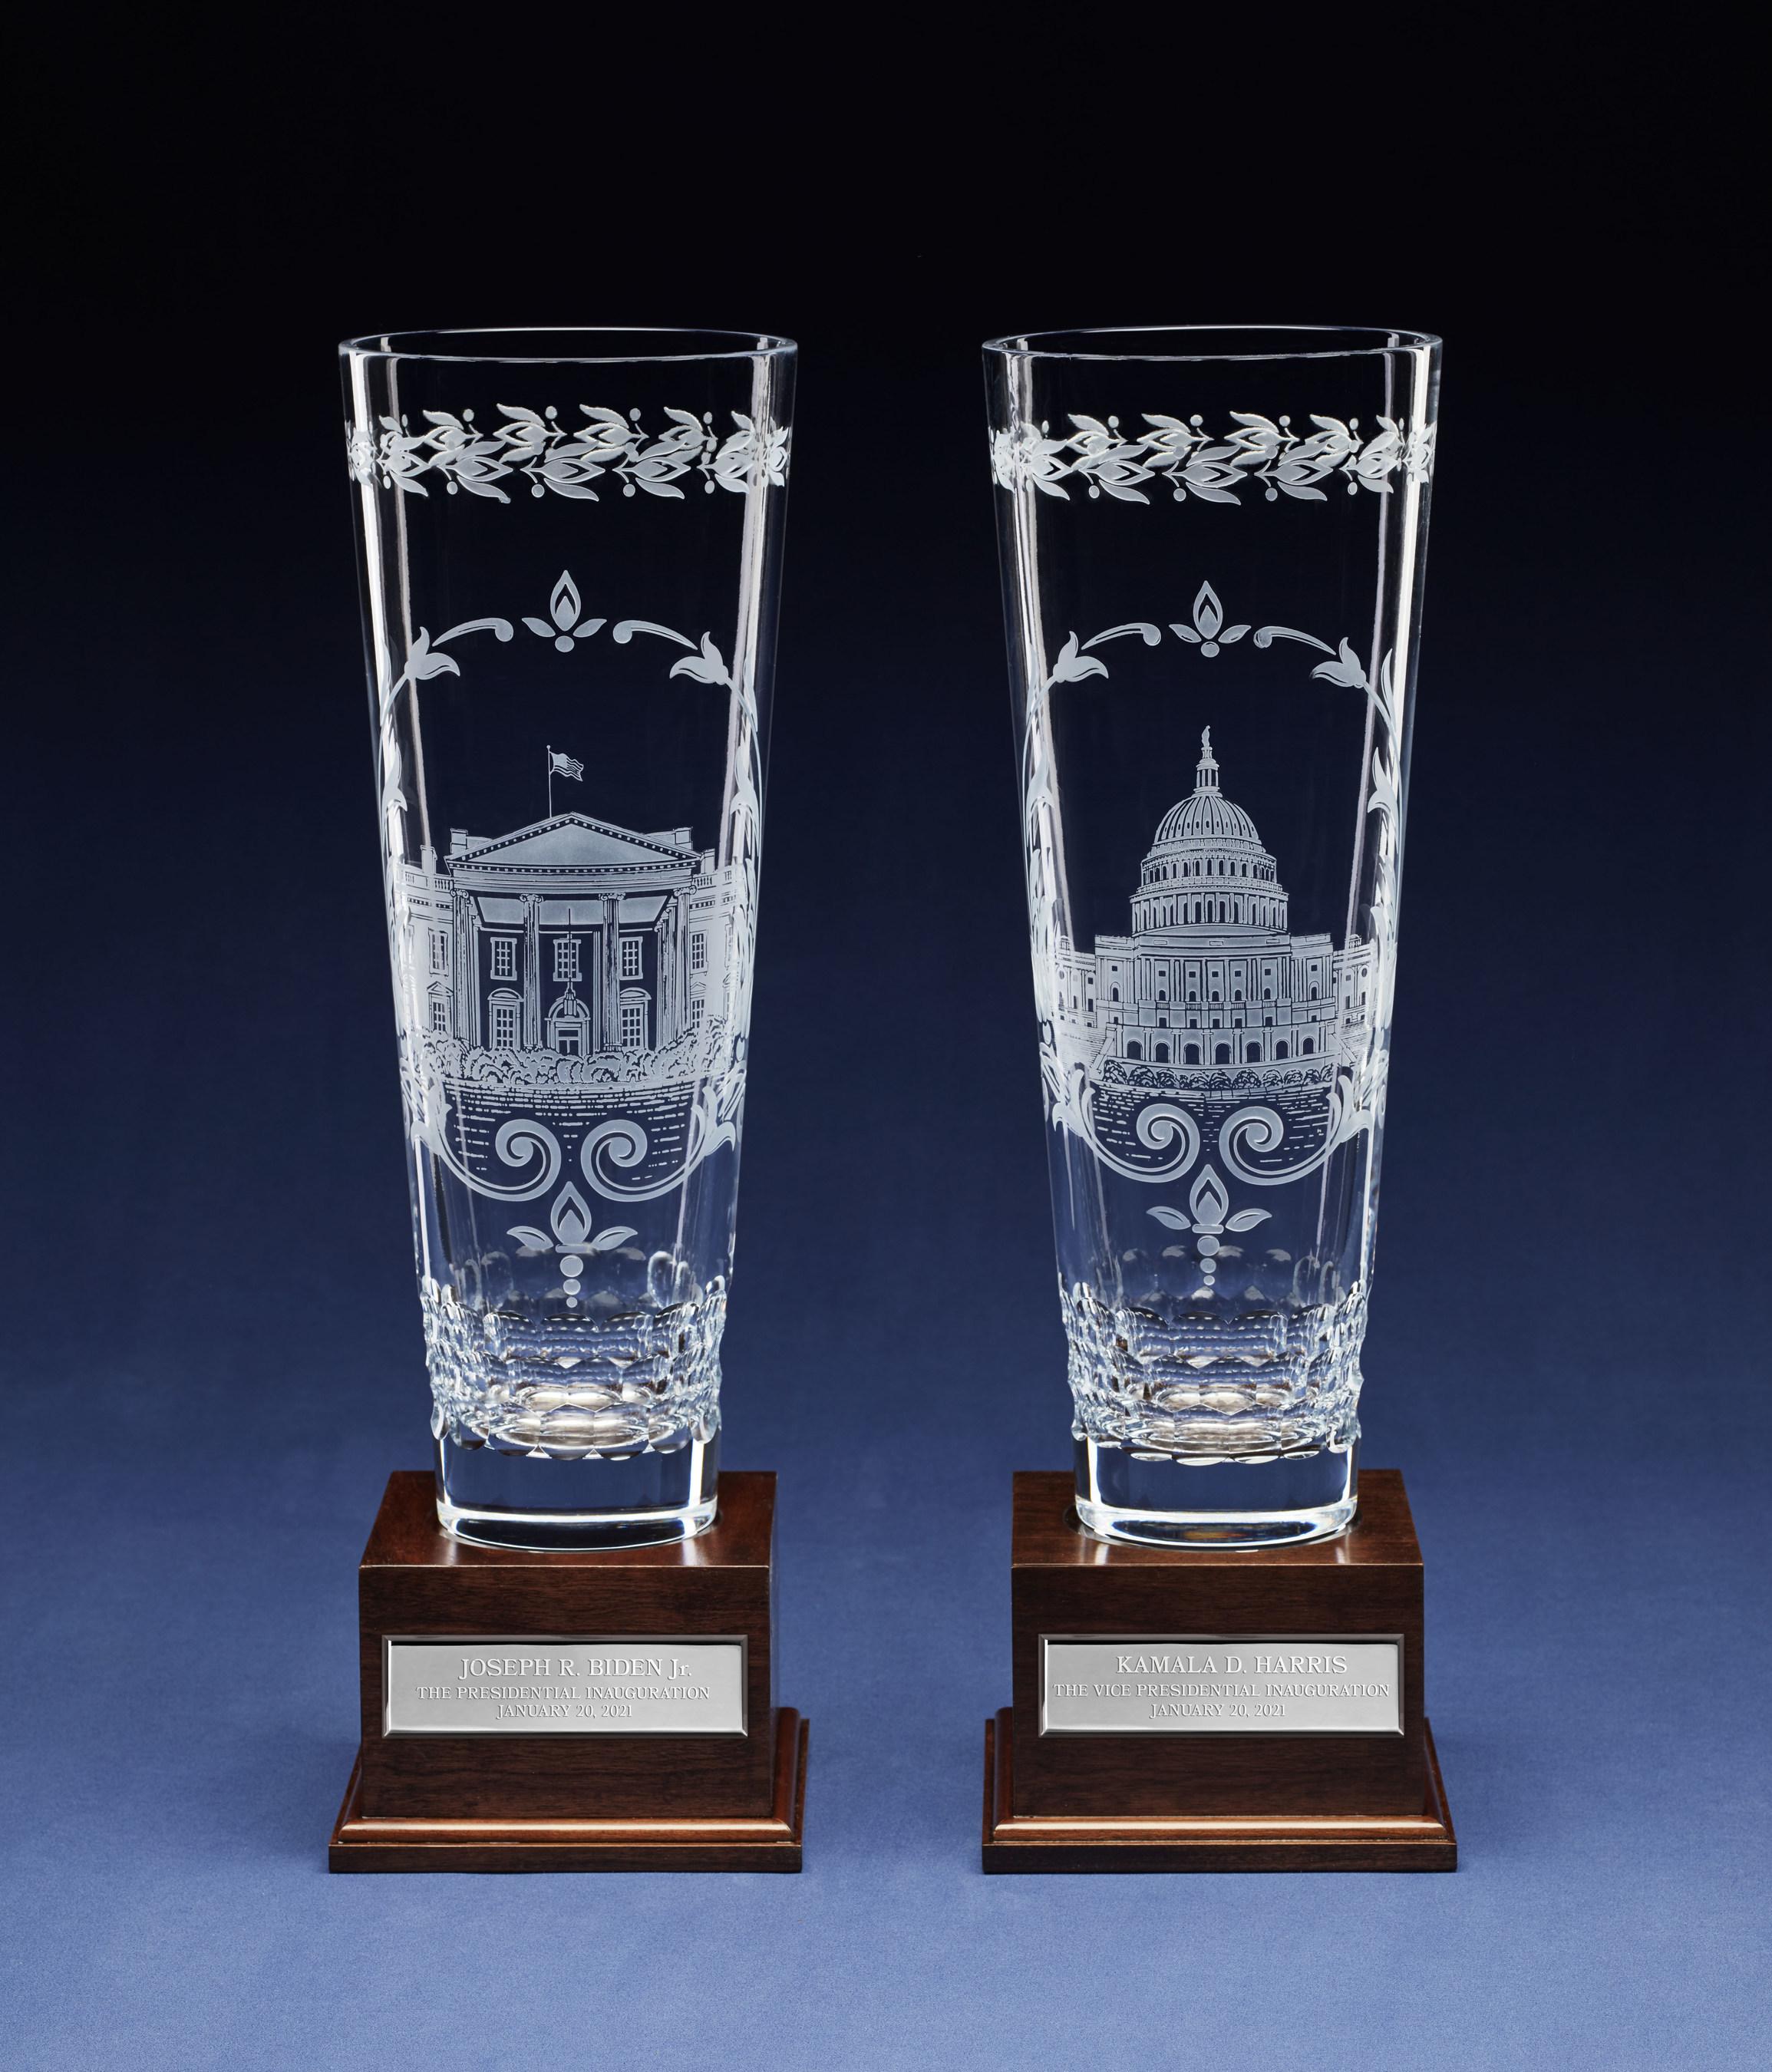 Lenox Corp. inaugural gifts, engraved crystal vases